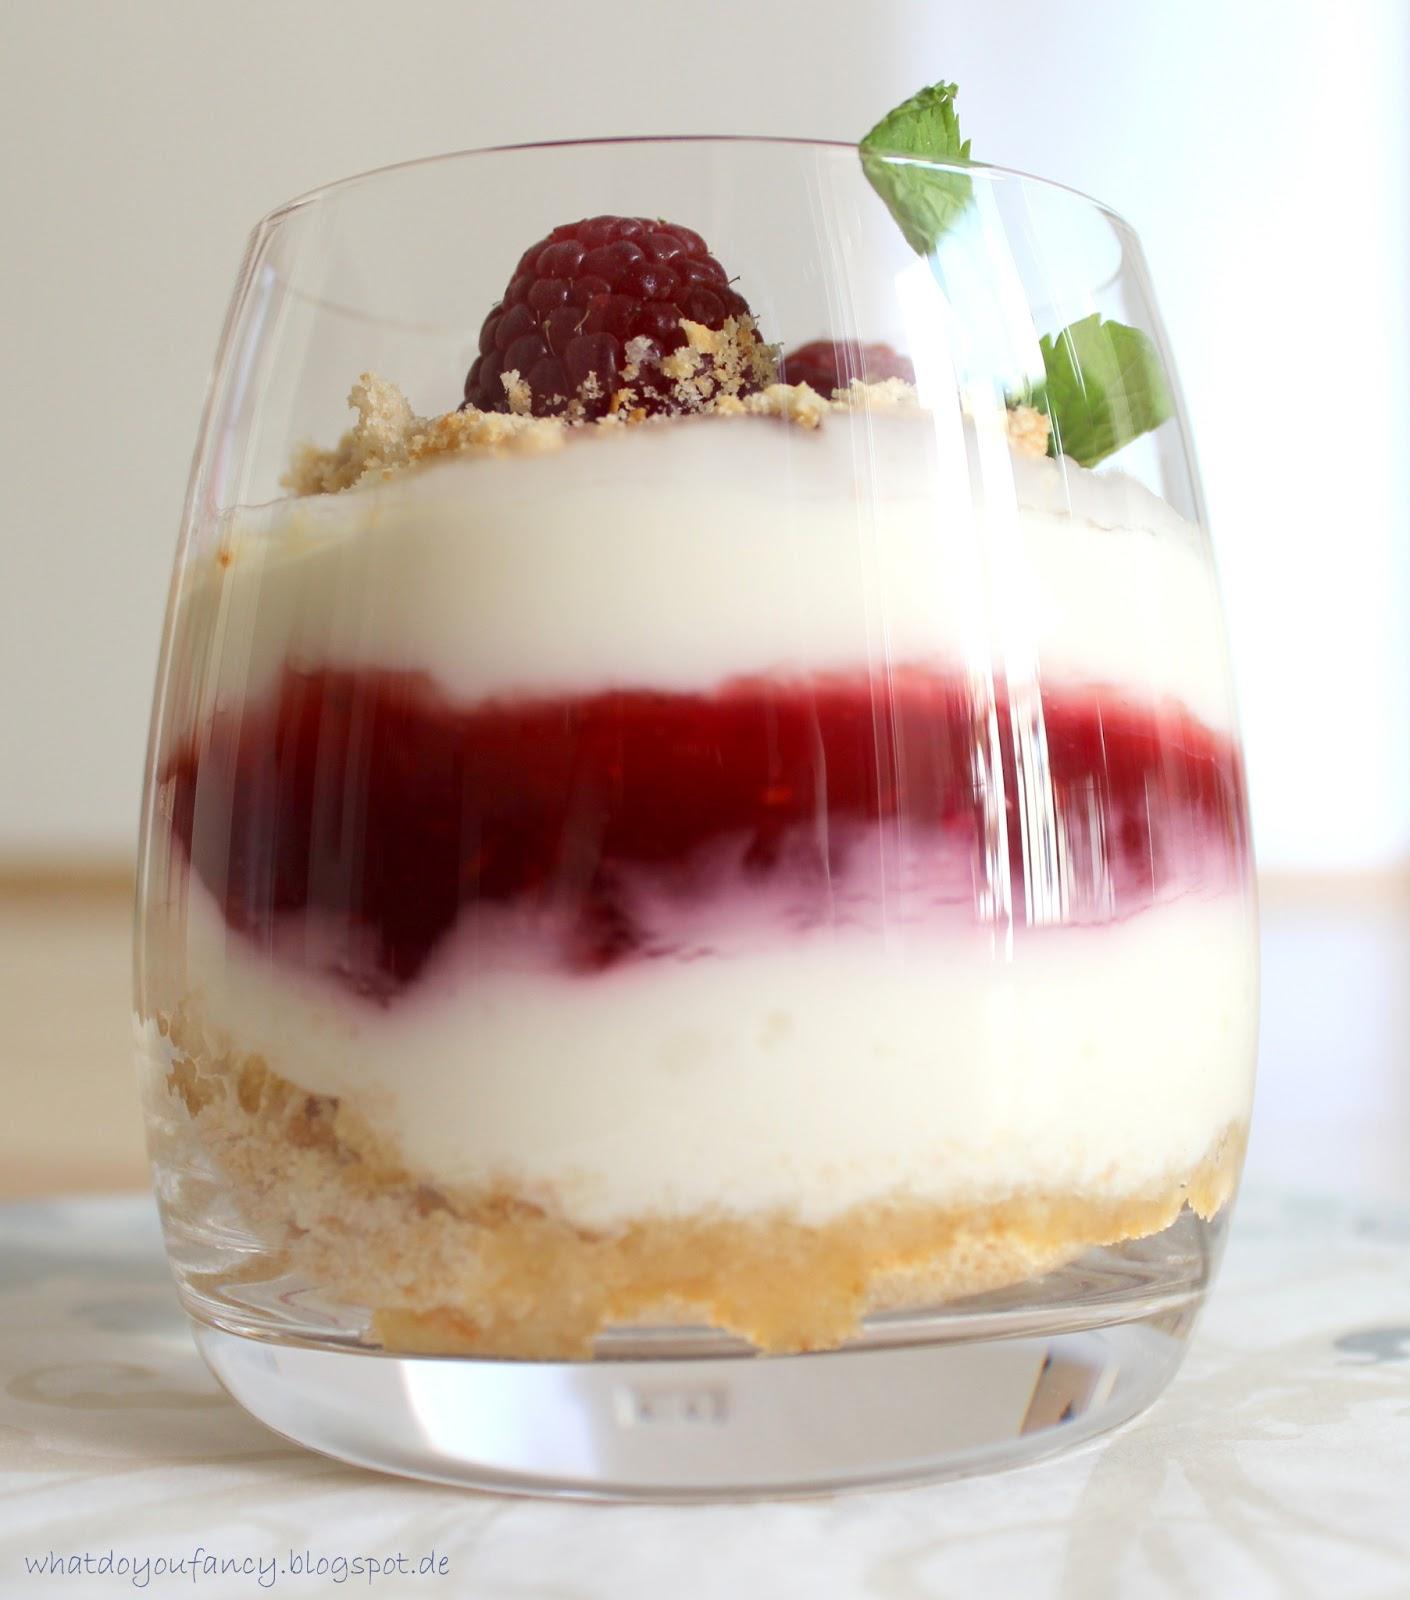 Cheesecake-Creme im Glas